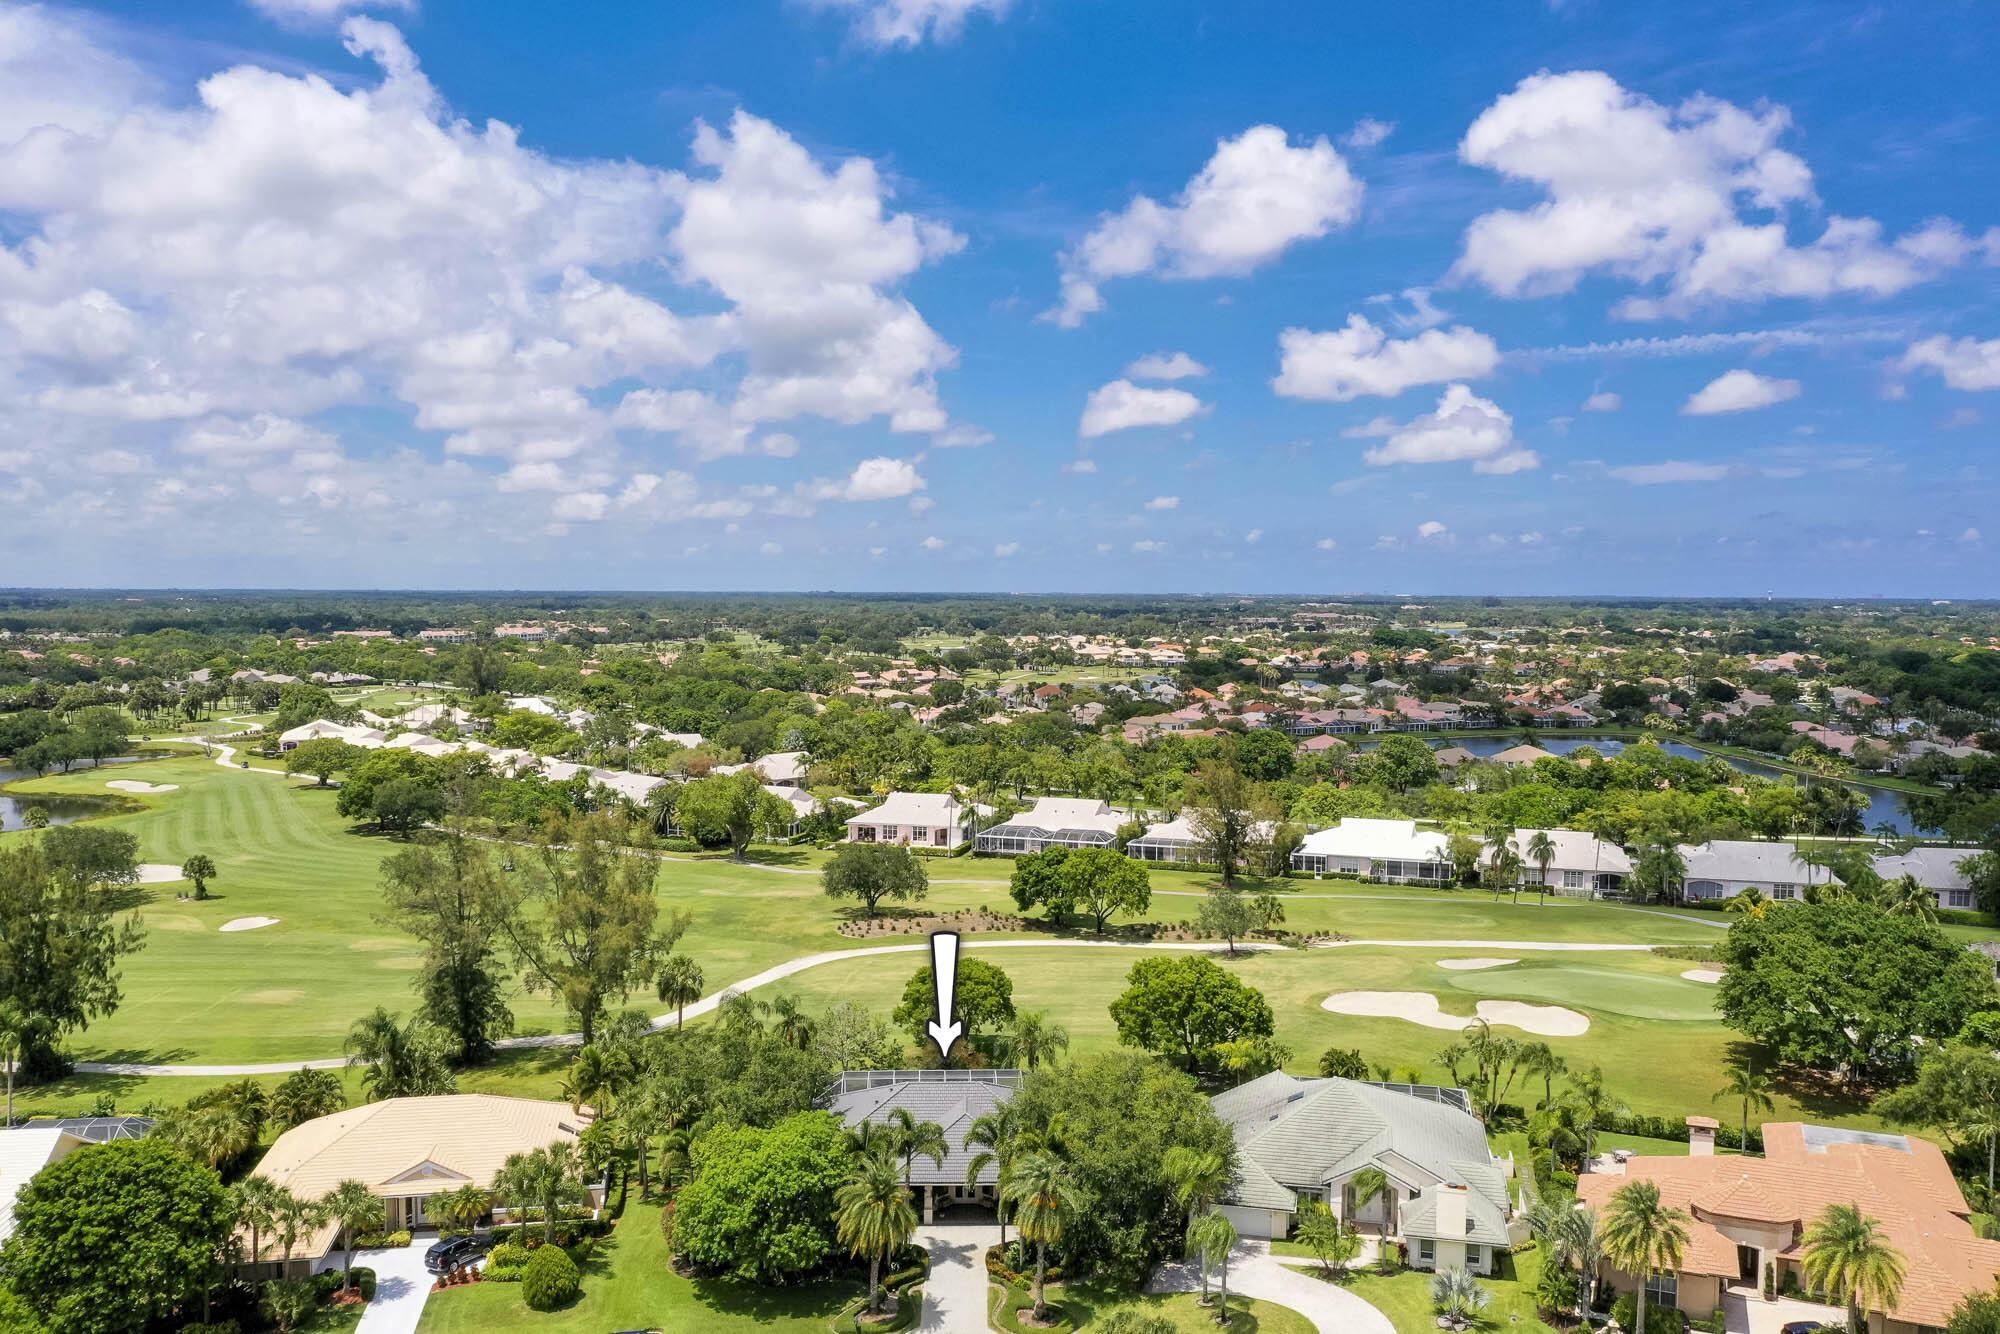 201  Thornton Drive  For Sale 10721425, FL